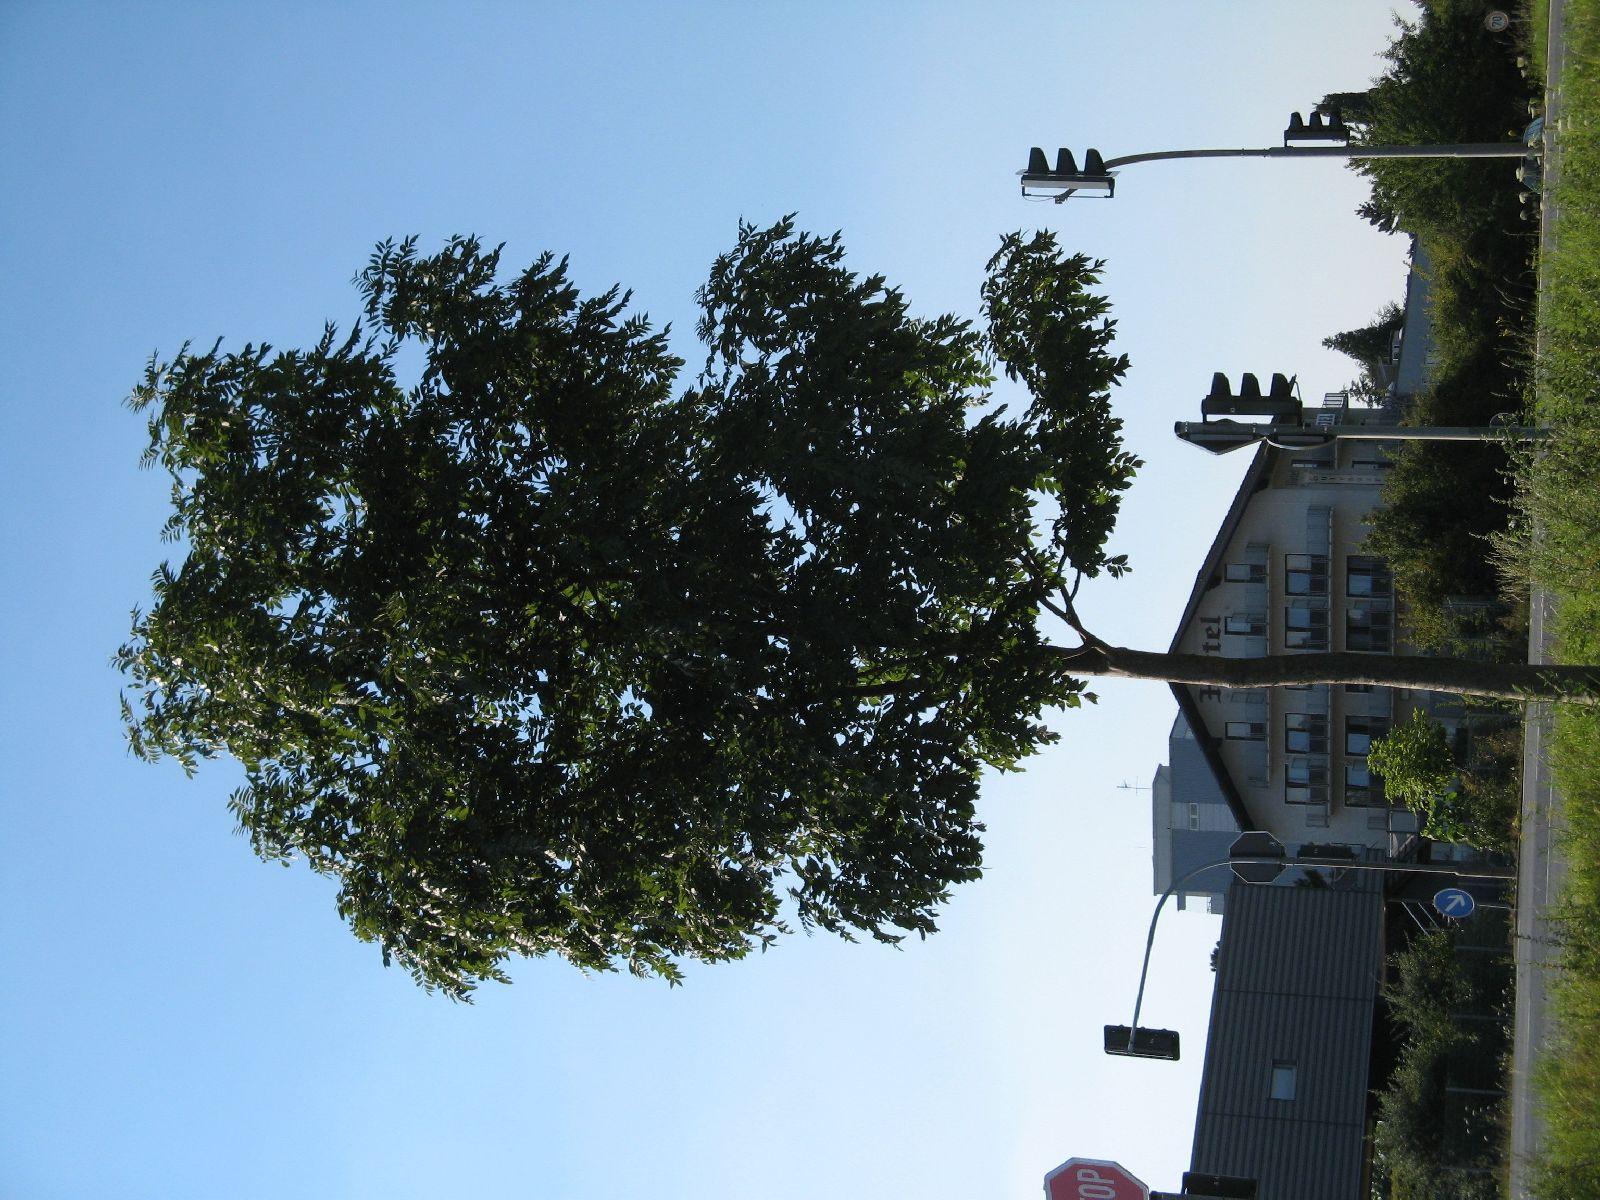 Plants-Trees_Photo_Texture_B_1179